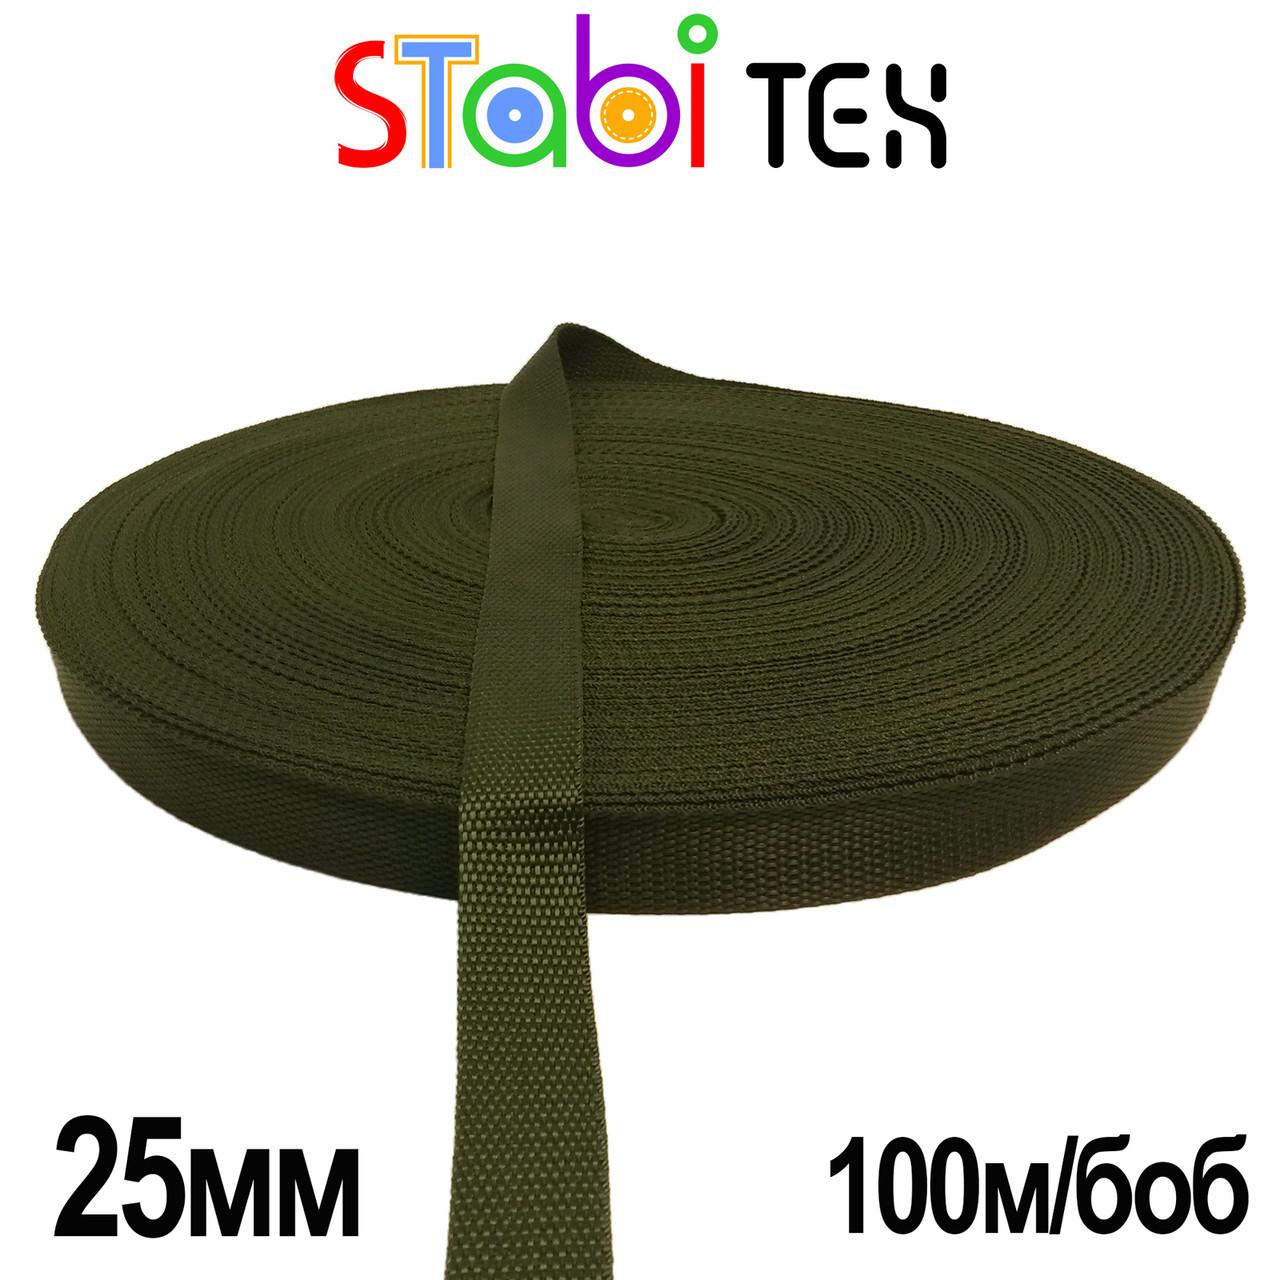 Лента ременная стропа 25мм 900Д (100м/боб) Хаки